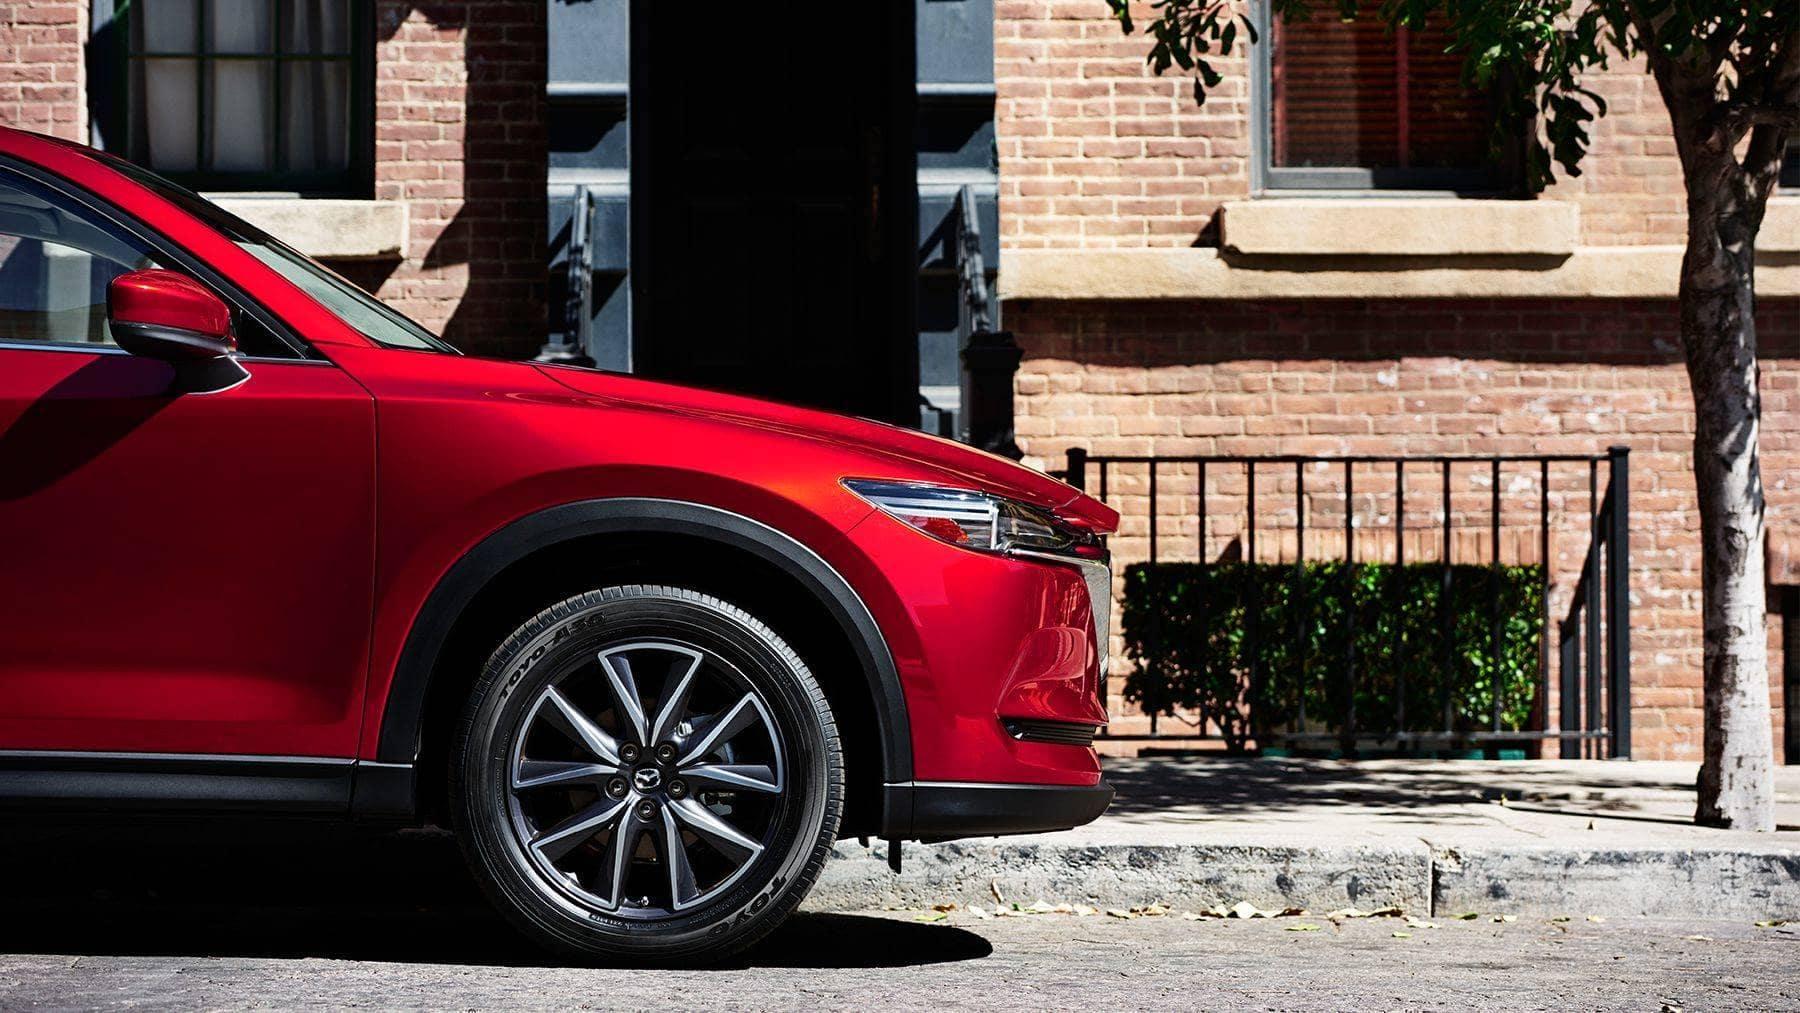 2018 Mazda CX-5 side profile street